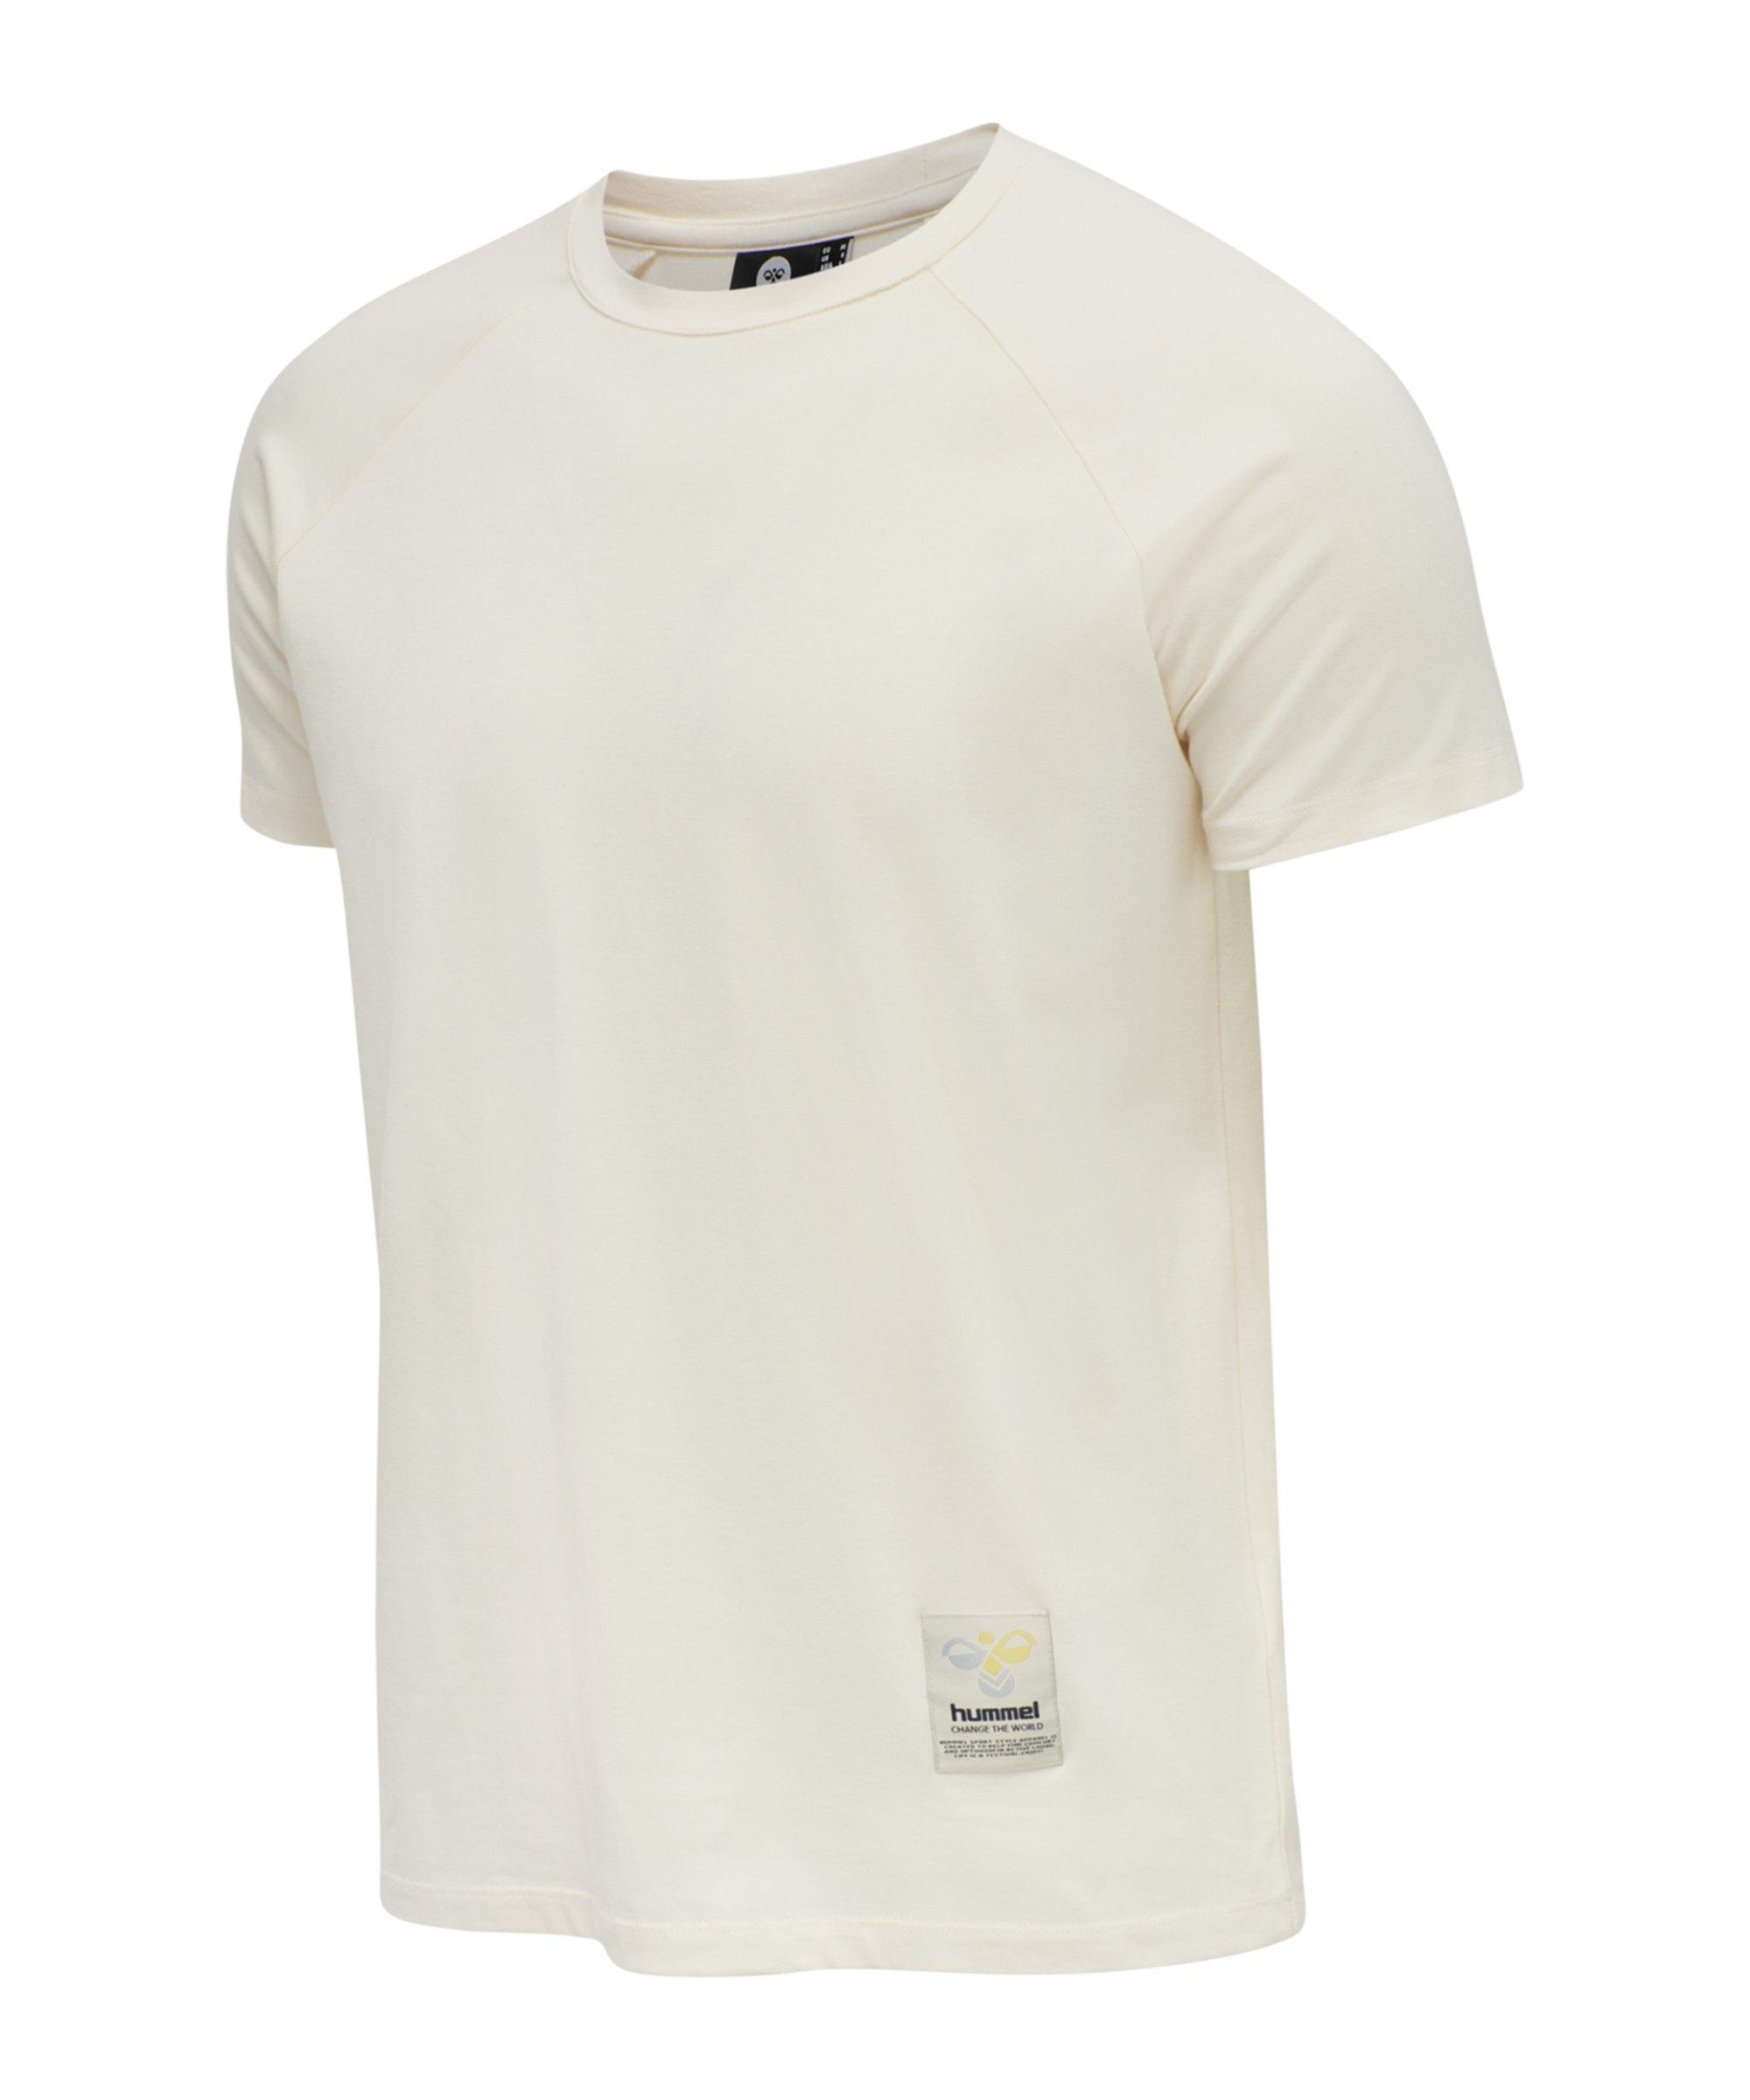 Hummel Jarvan T-Shirt Beige F9078 - beige